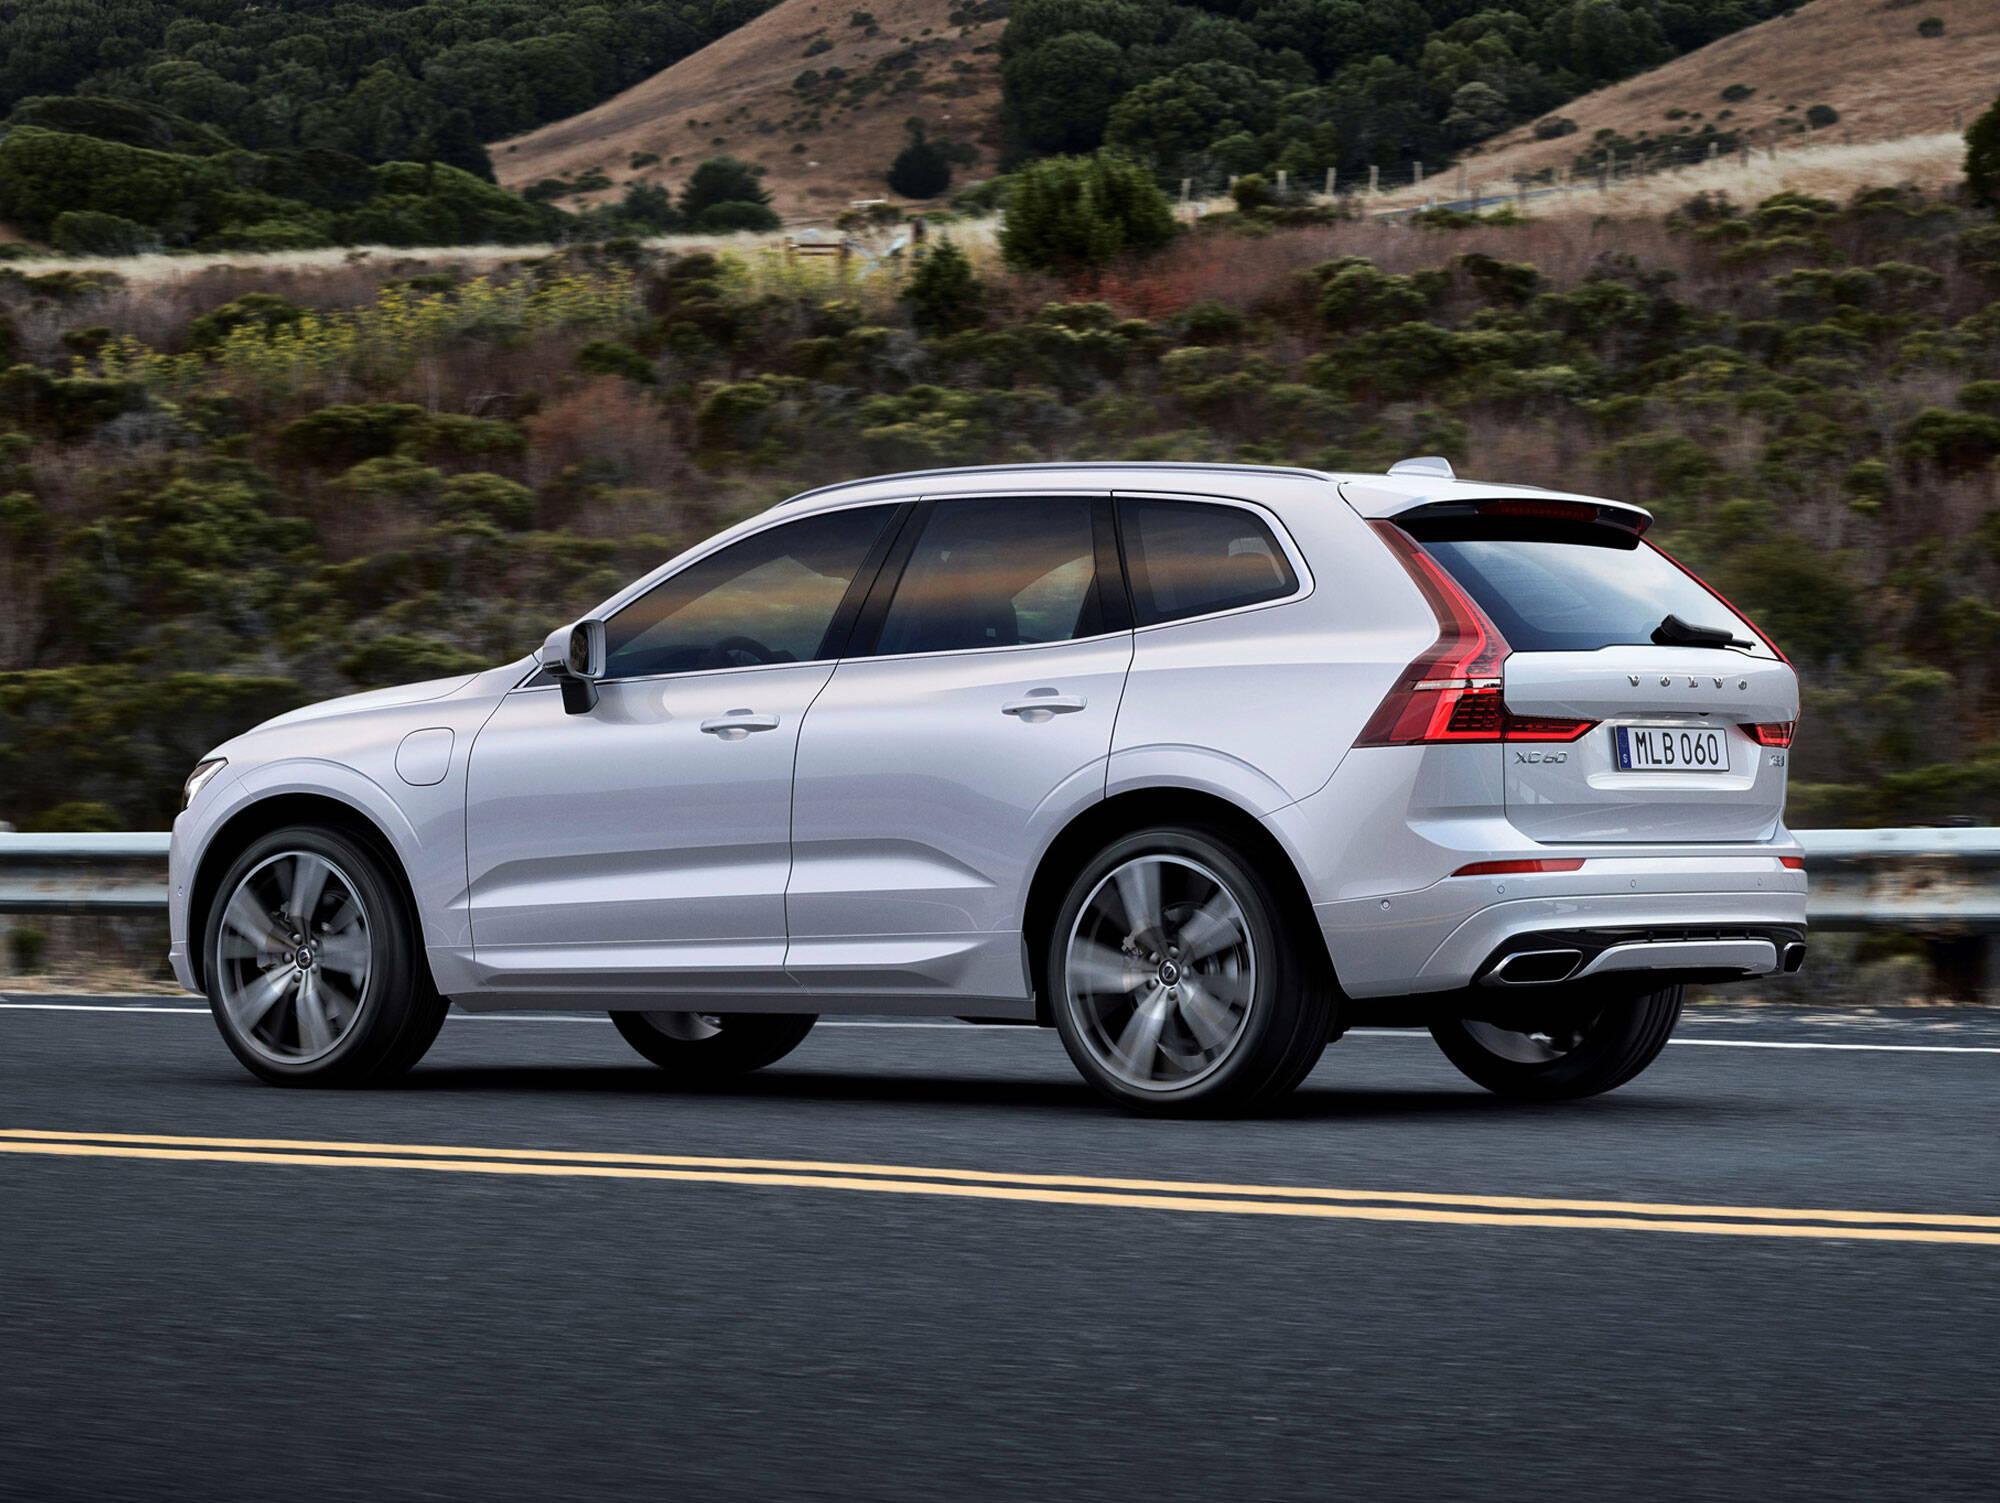 Volvo XC60. Foto: Divulgação/Volvo